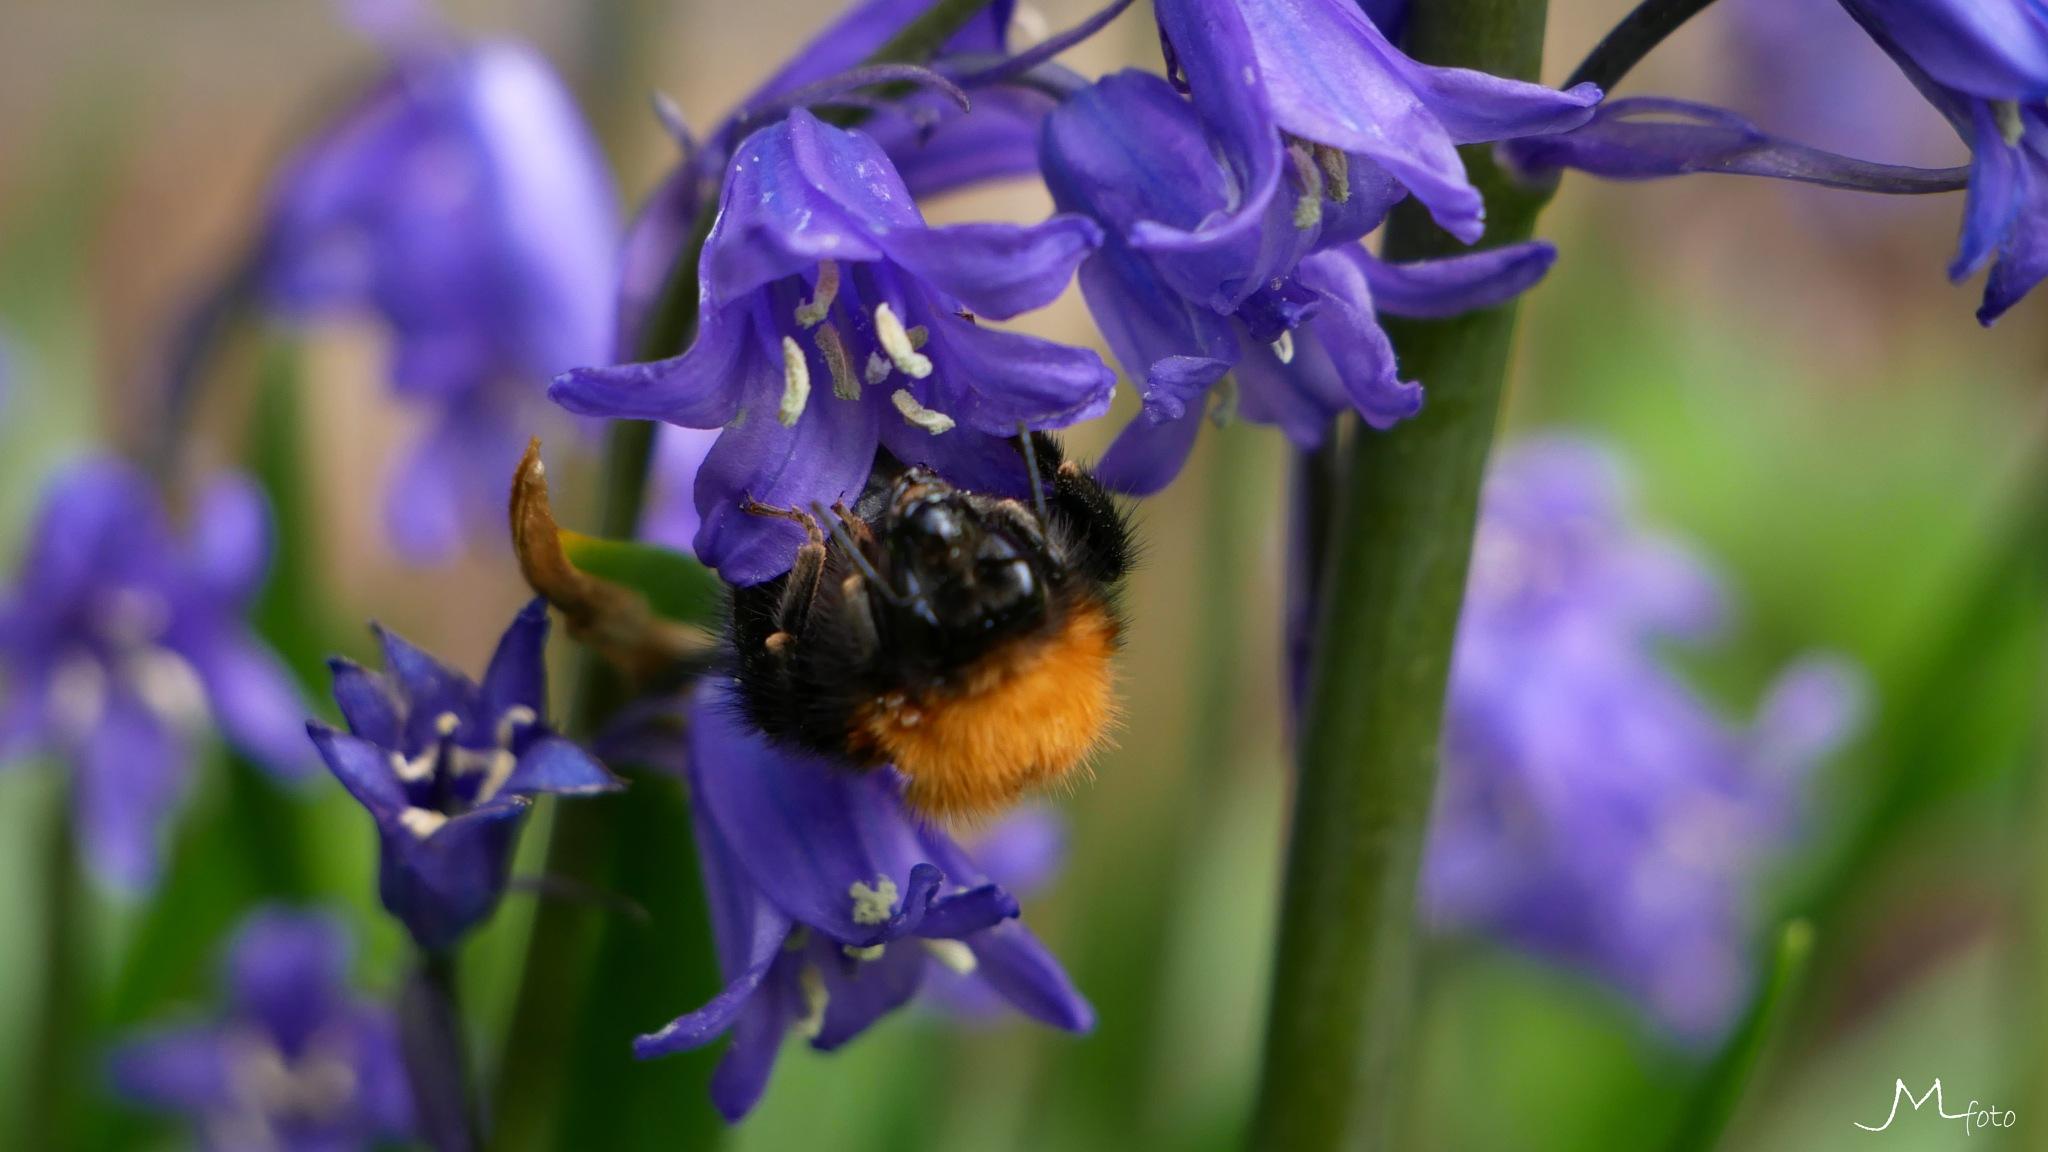 Bumblebee 2 by JMLart